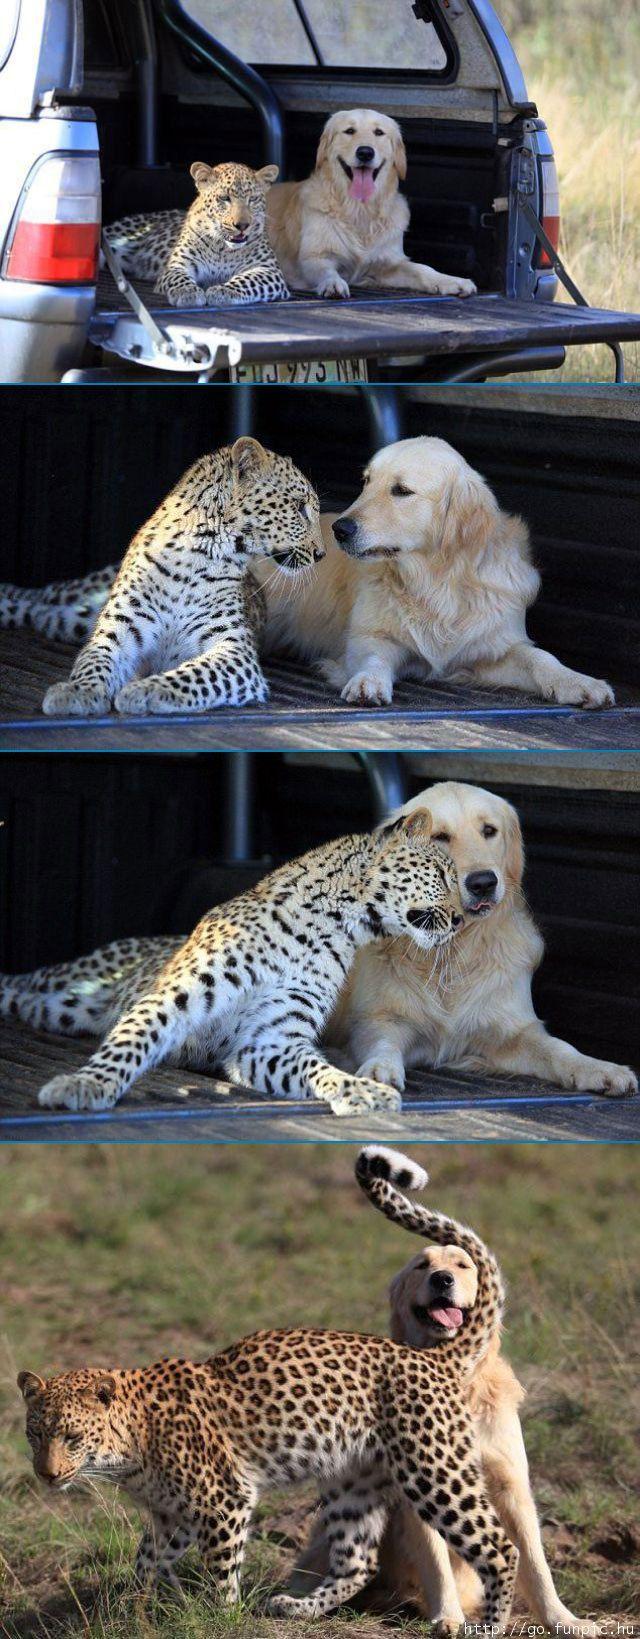 Best Friends! :)